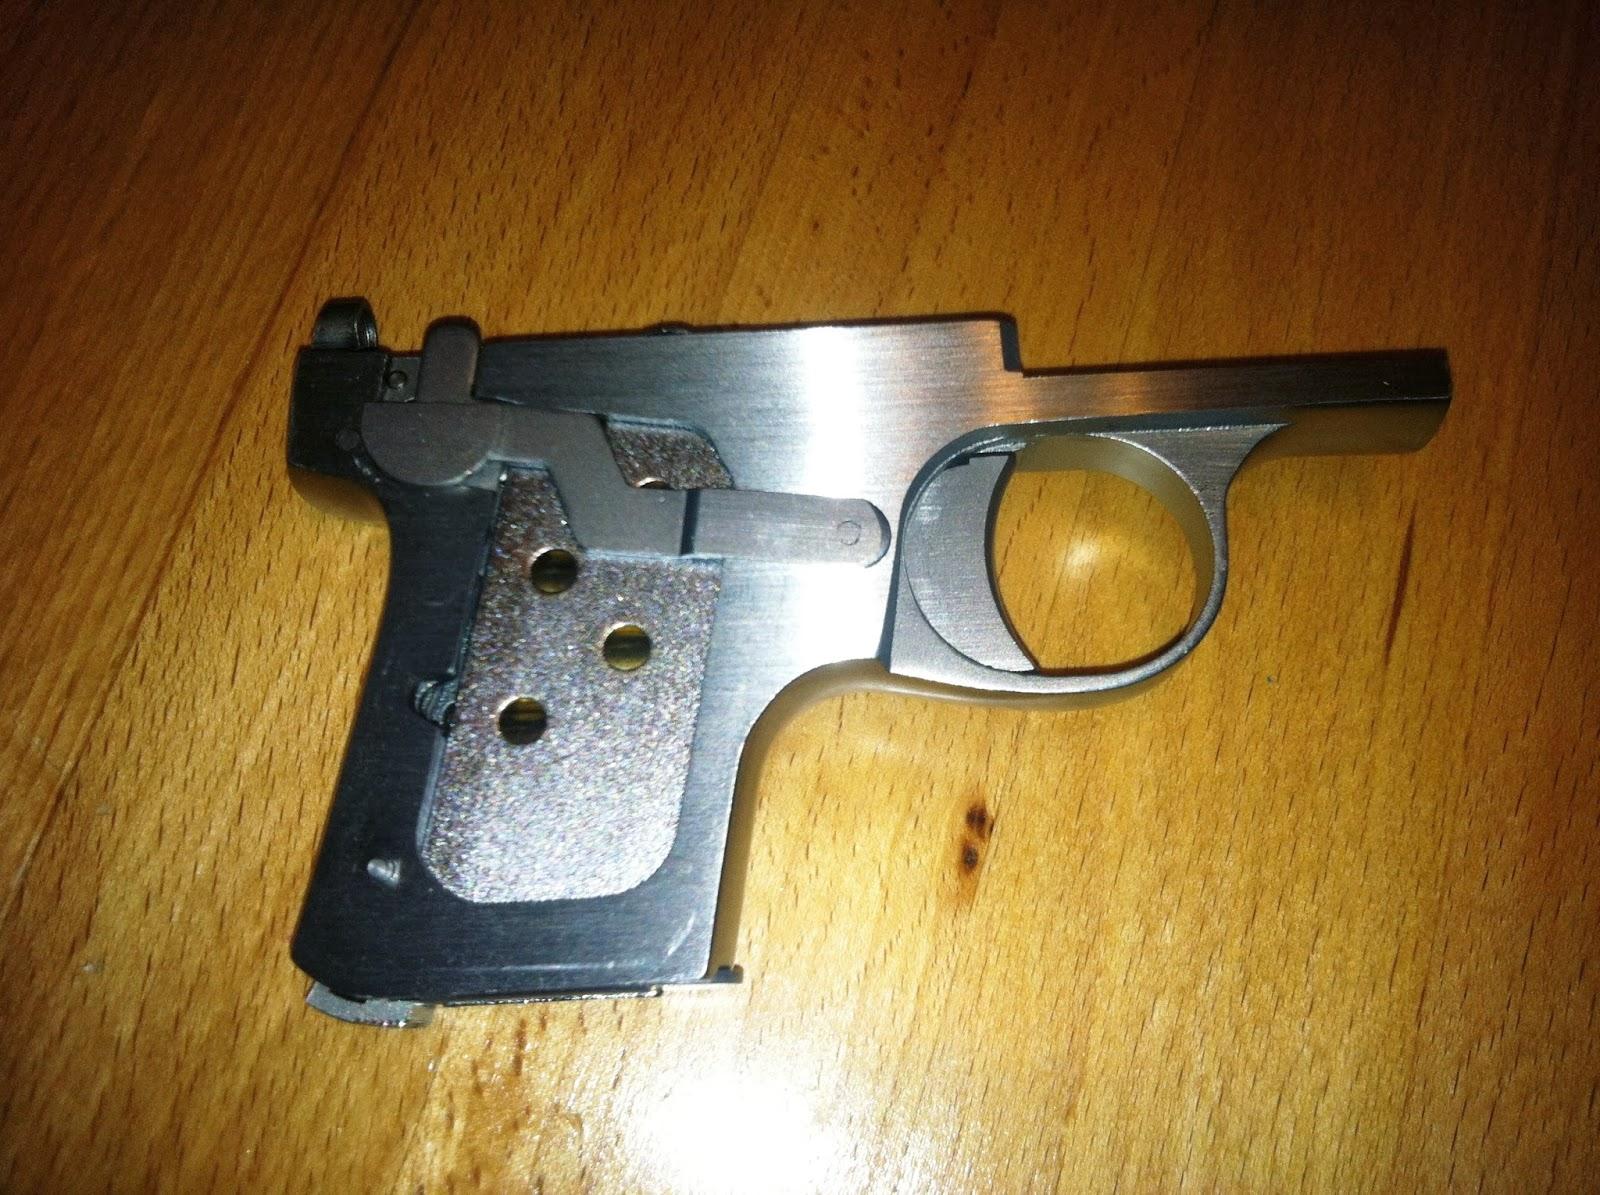 uncle barky's gun blog: 2013